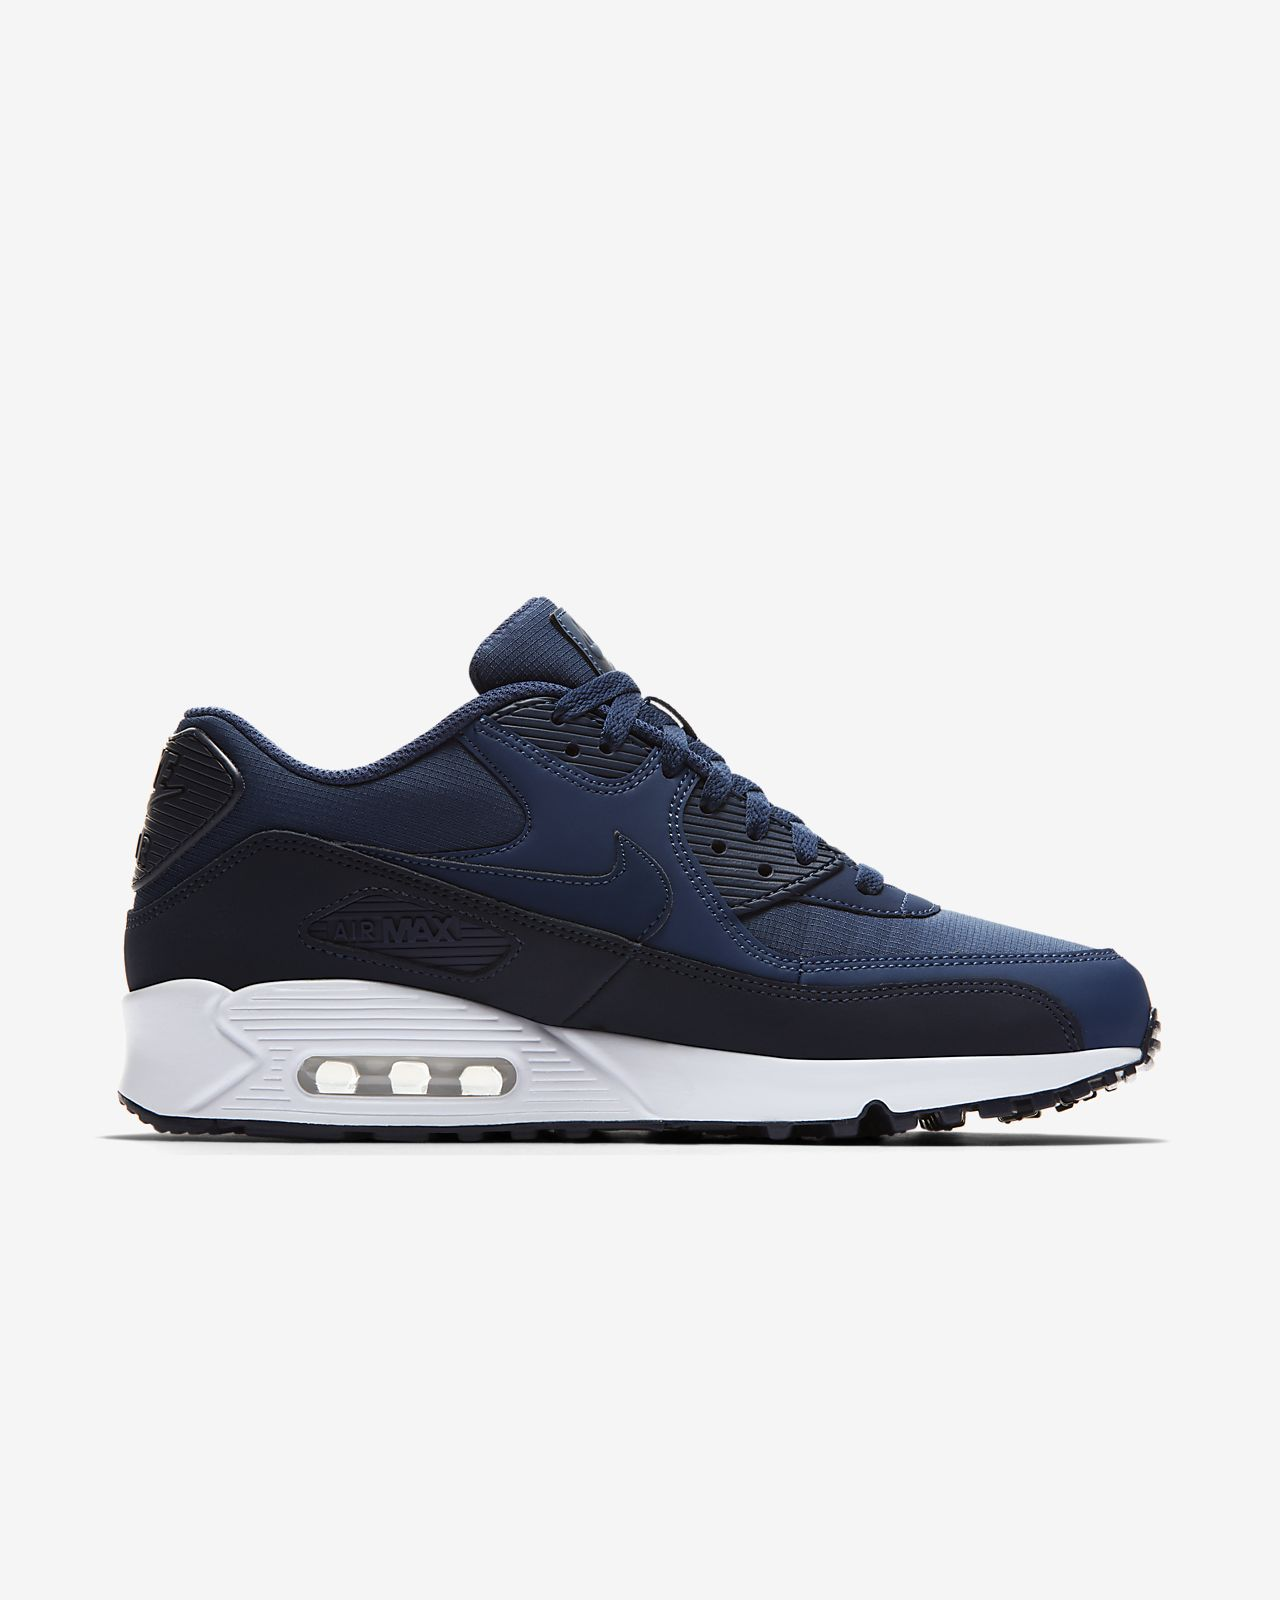 Hommes Nike Air Max 90 Og Formateurs - Bleu - 43 Eu IWelajxdCV